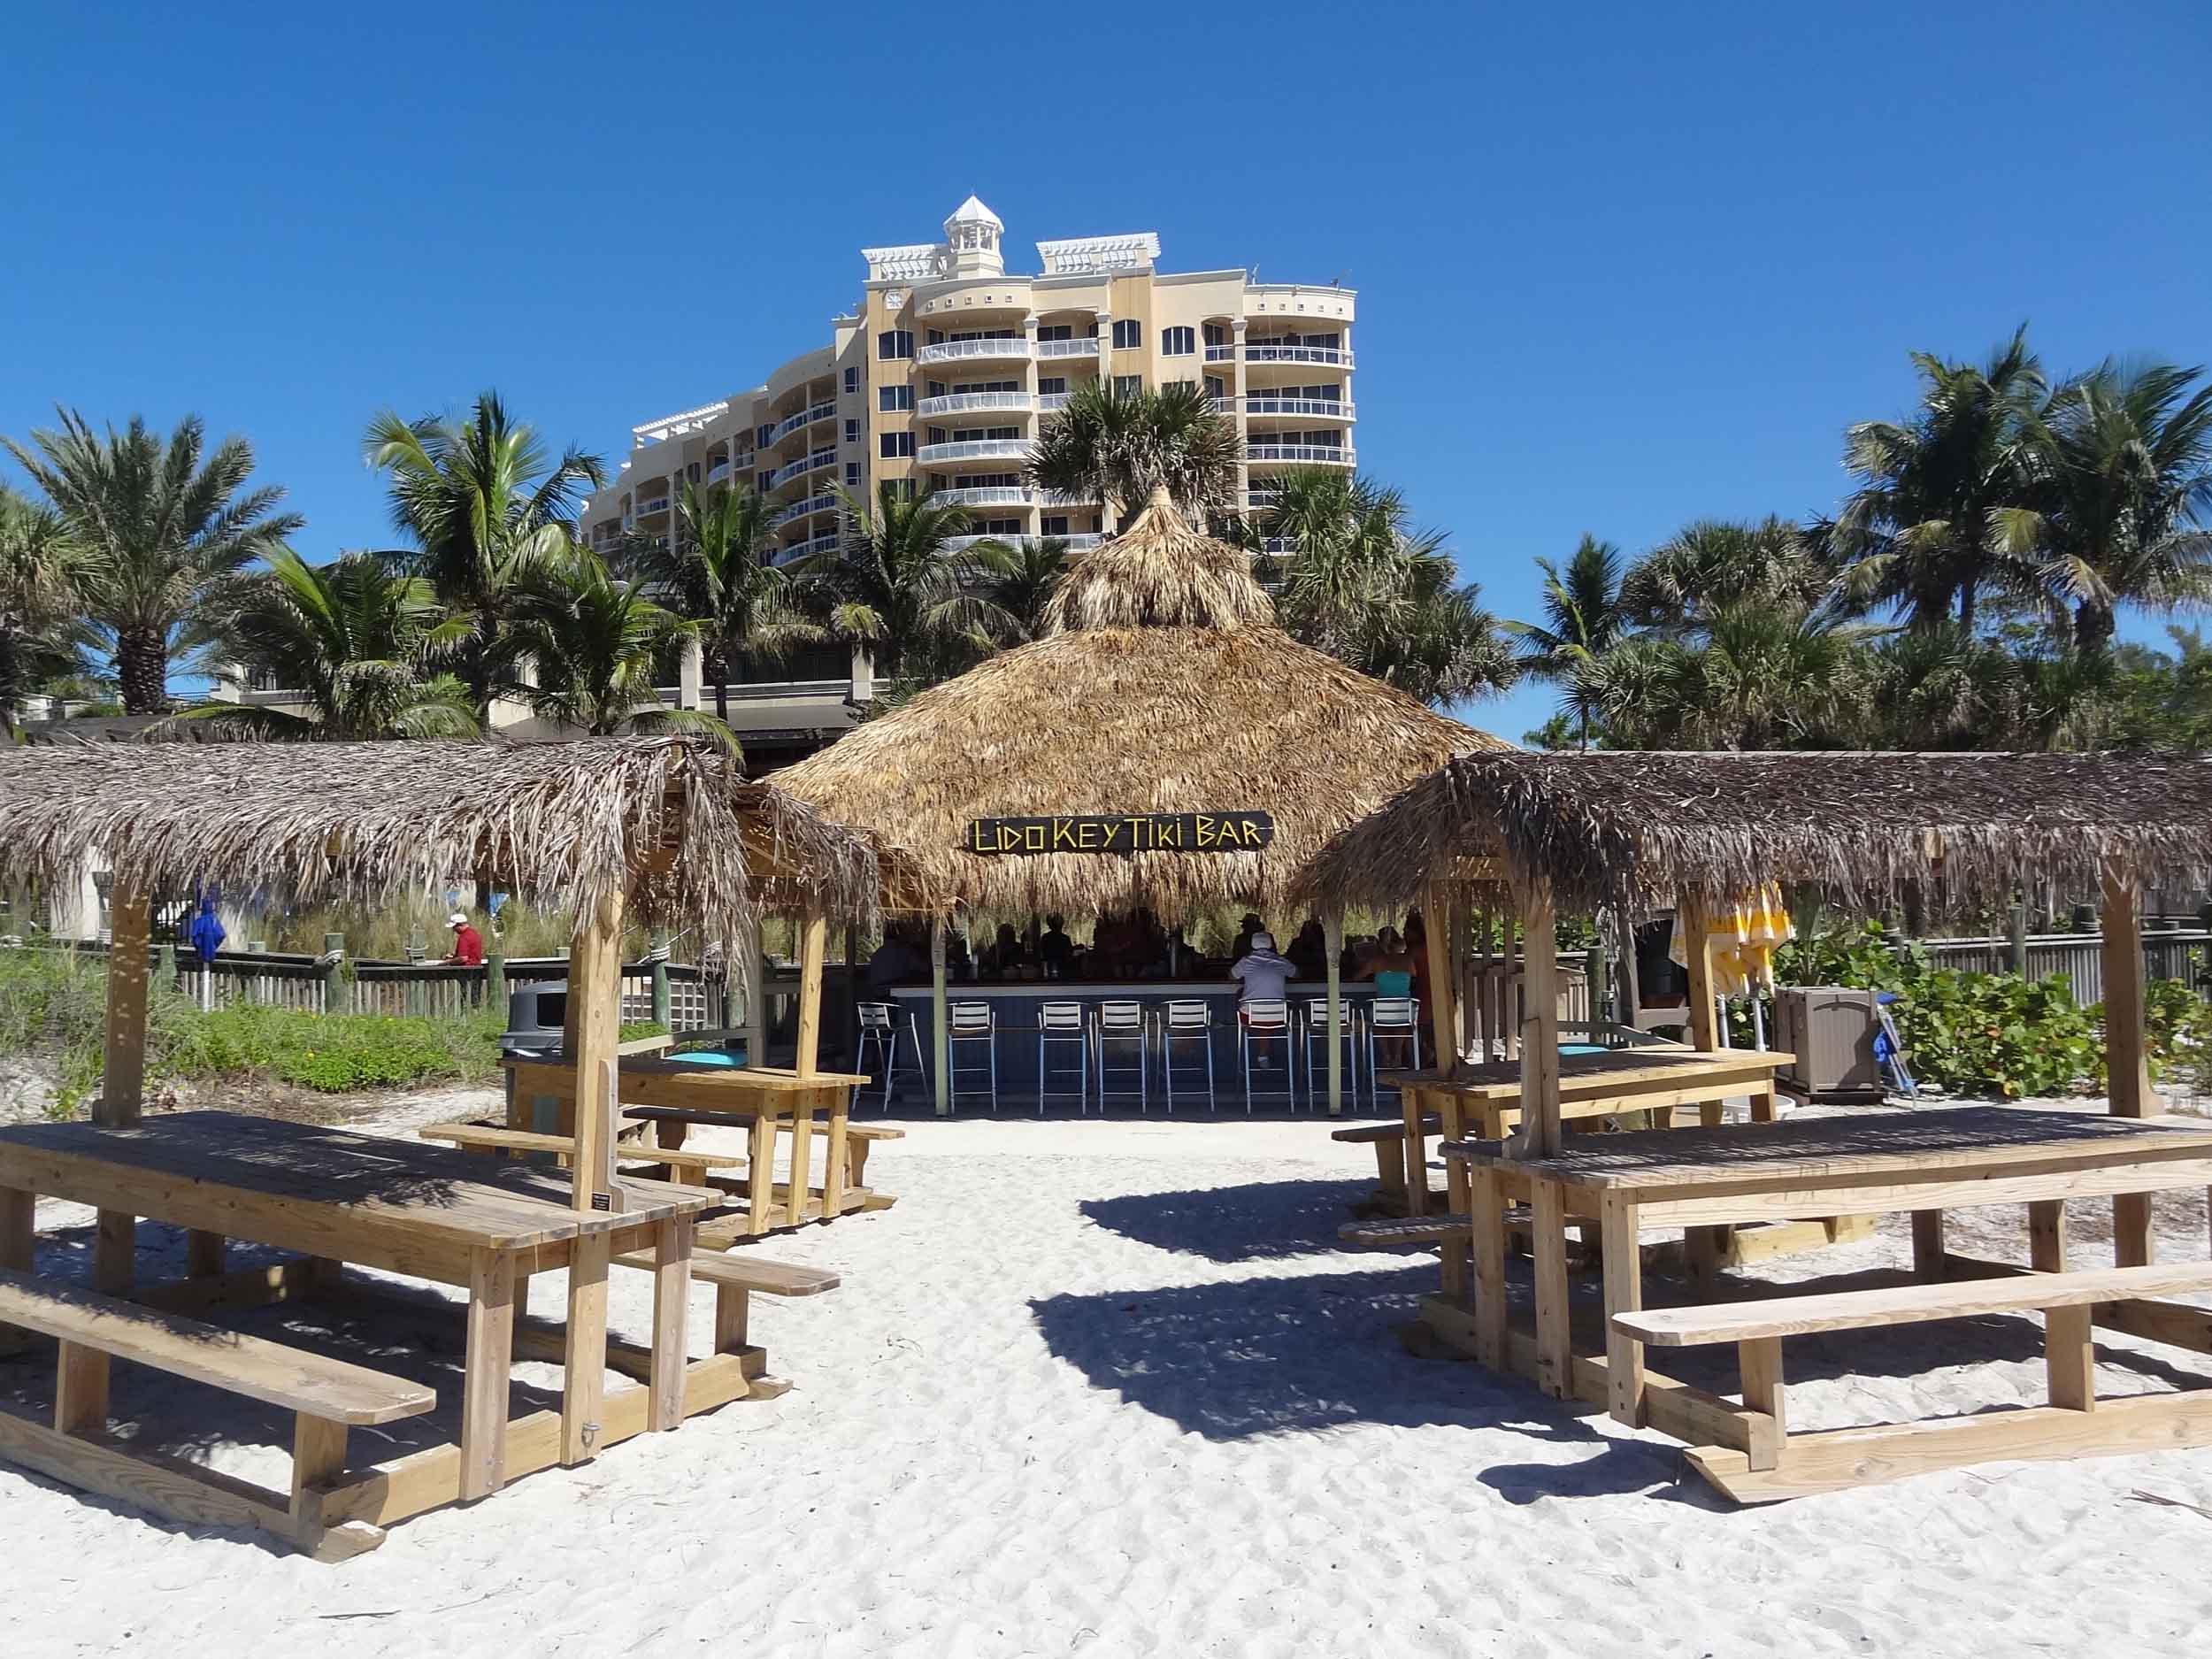 Lido Key Tiki Bar in the Sand